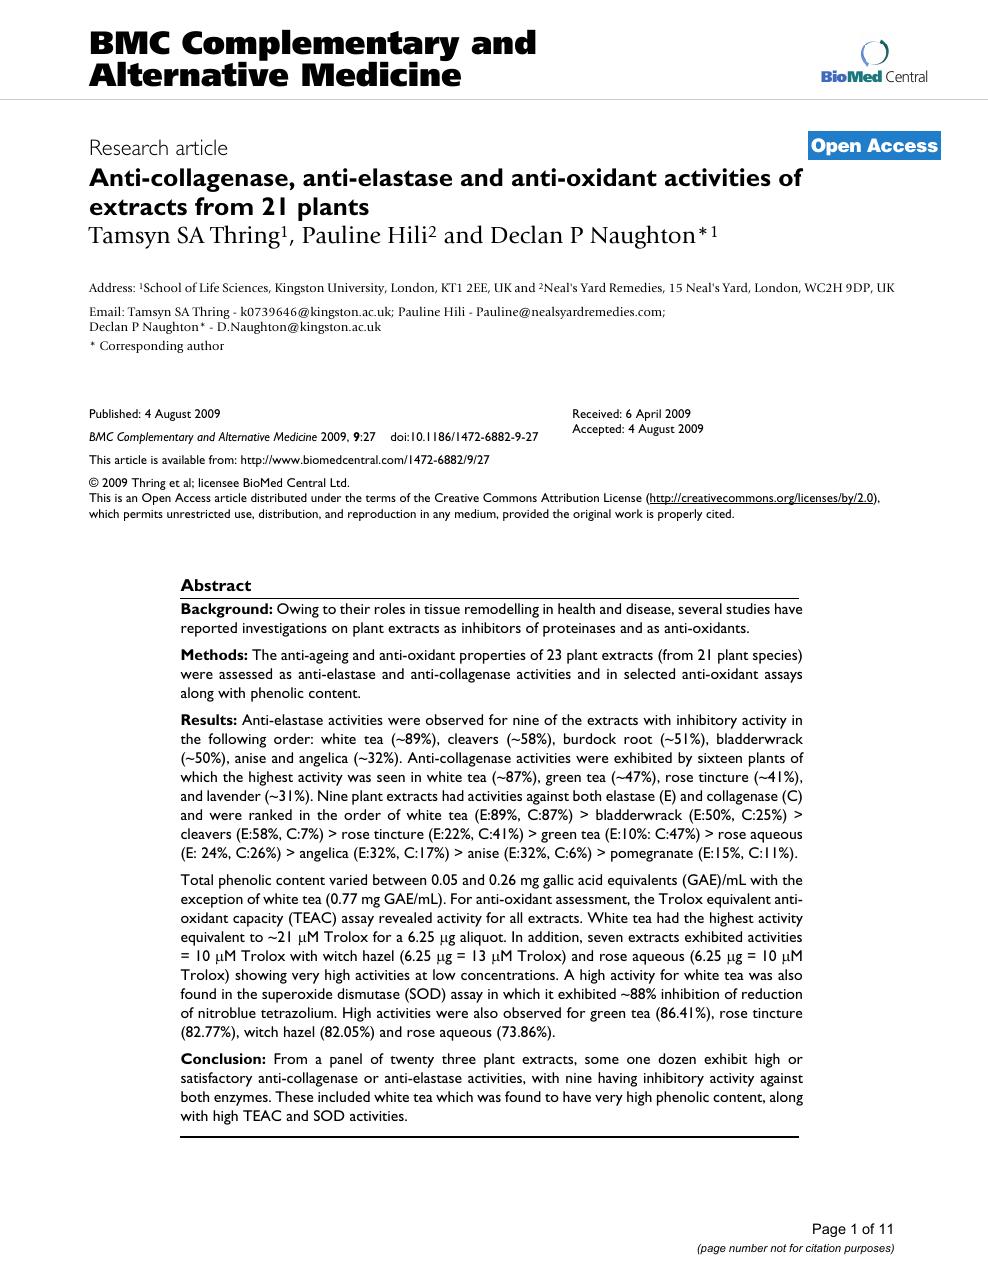 Anti-collagenase, anti-elastase and anti-oxidant activities